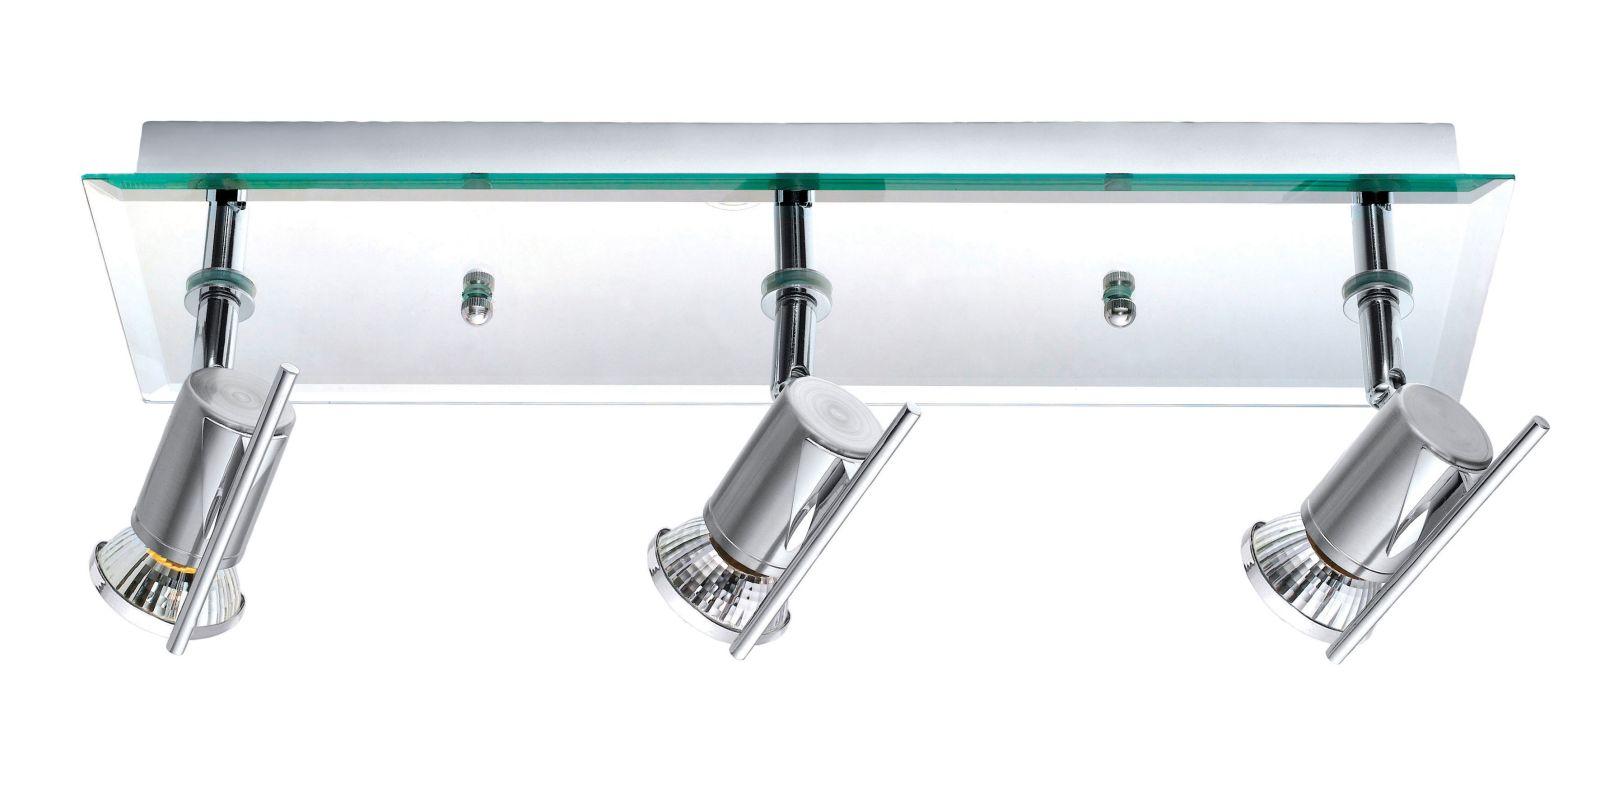 Eglo 90685A 3 Light Semi-Flush Ceiling Fixture from the Tamara